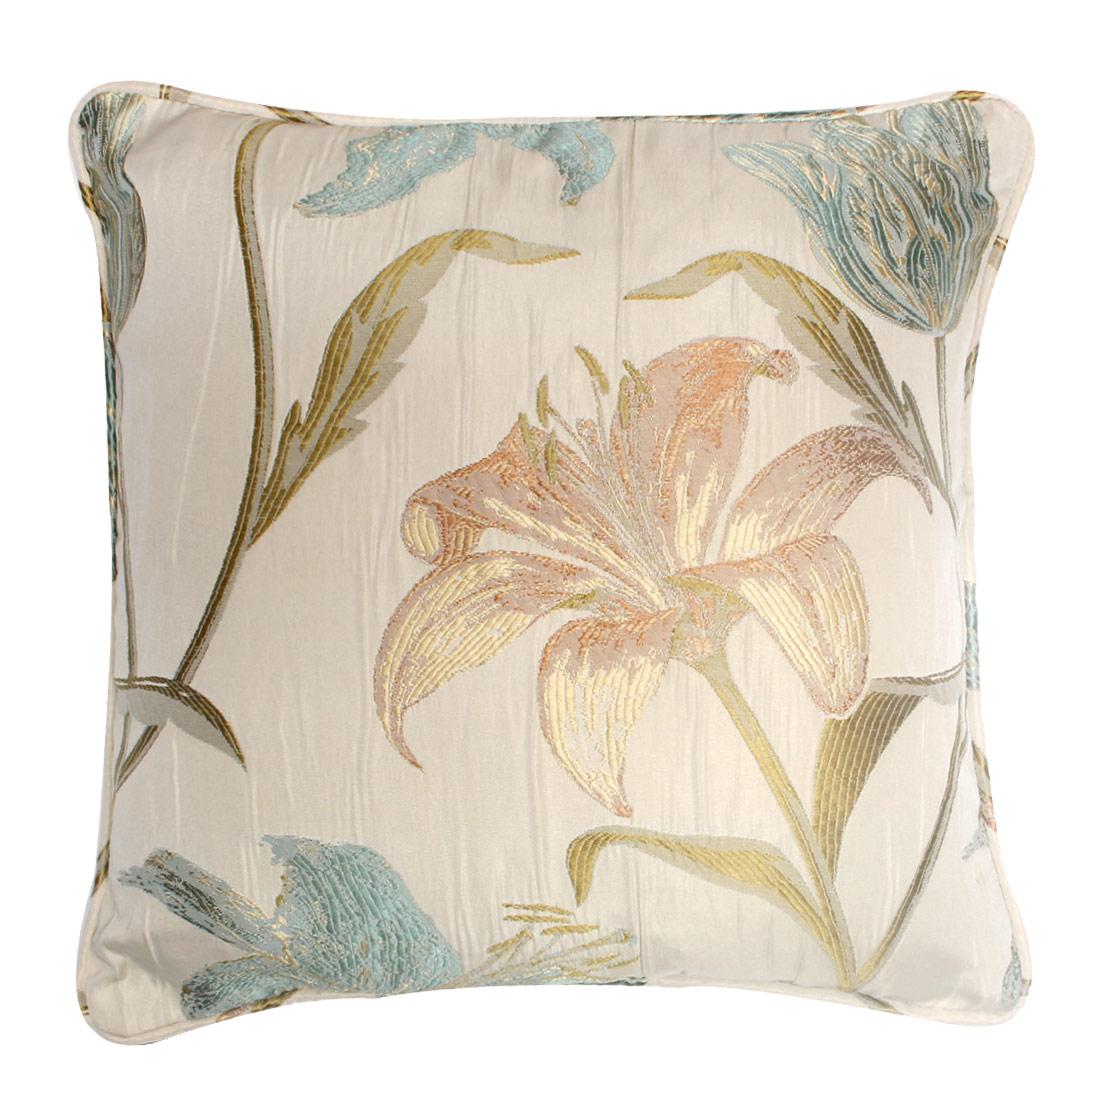 Lily Aqua Cushion Cover